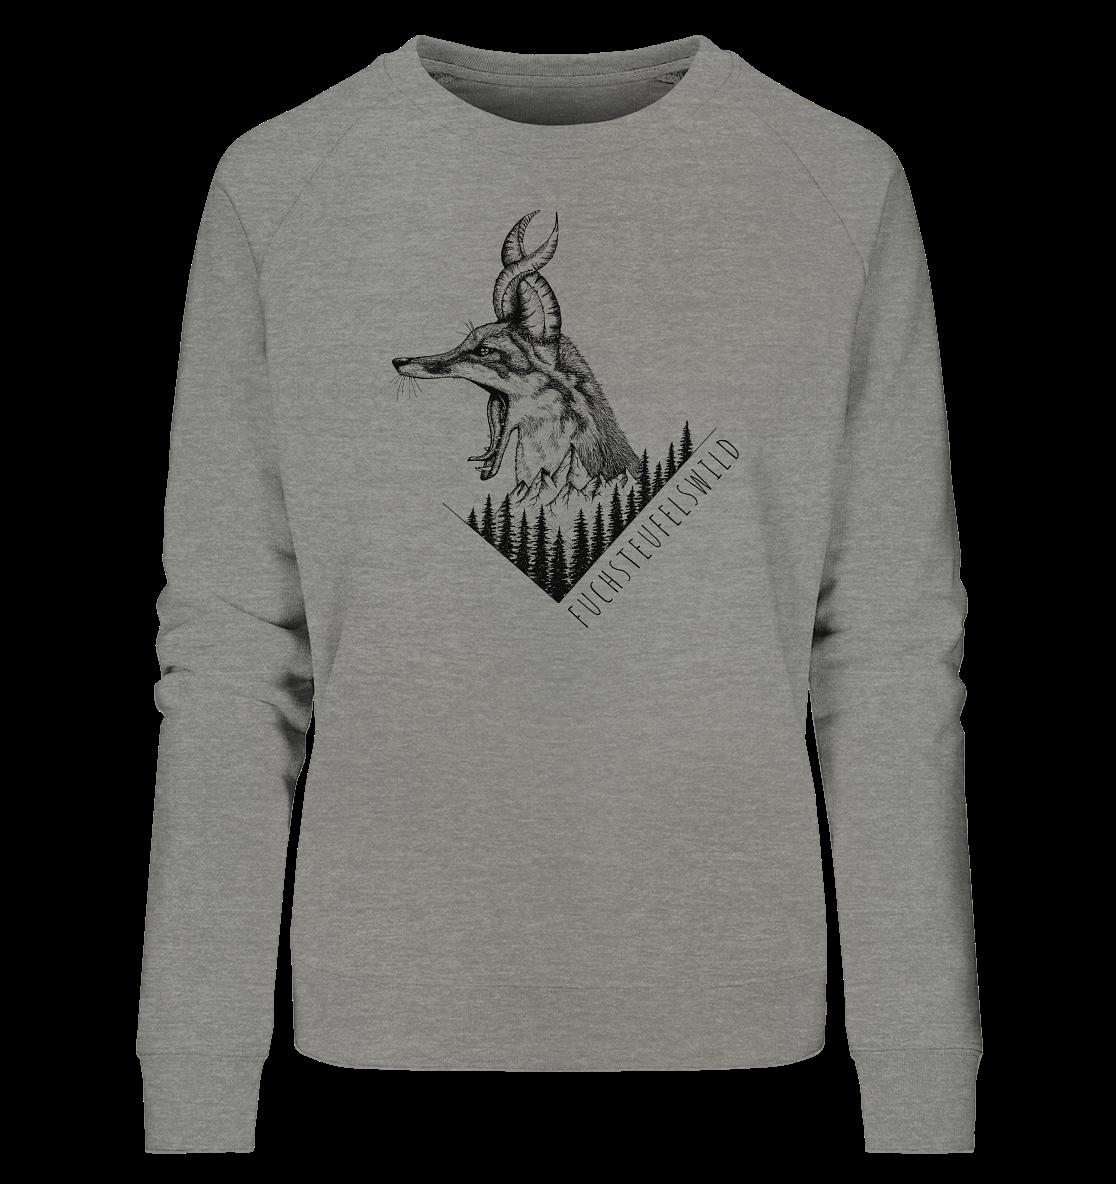 front-ladies-organic-sweatshirt-818381-1116x-7.png